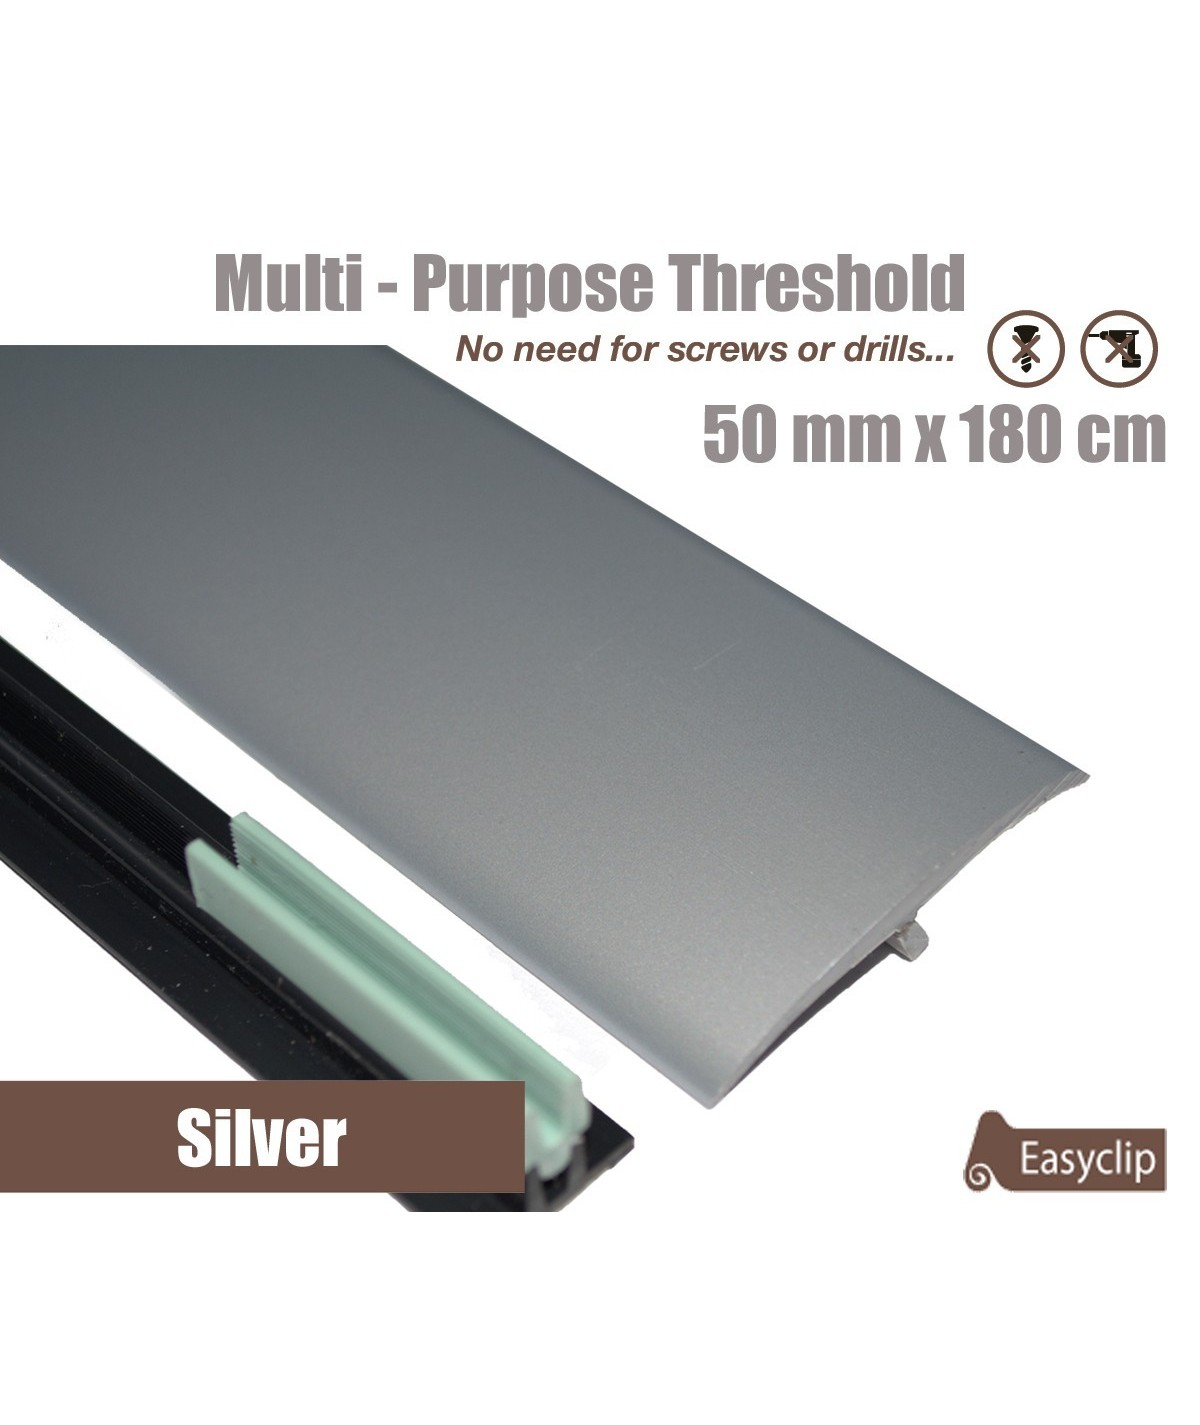 Silver Laminated Transition Threshold Strip  50mm x180cm Multi-Height/Pivots